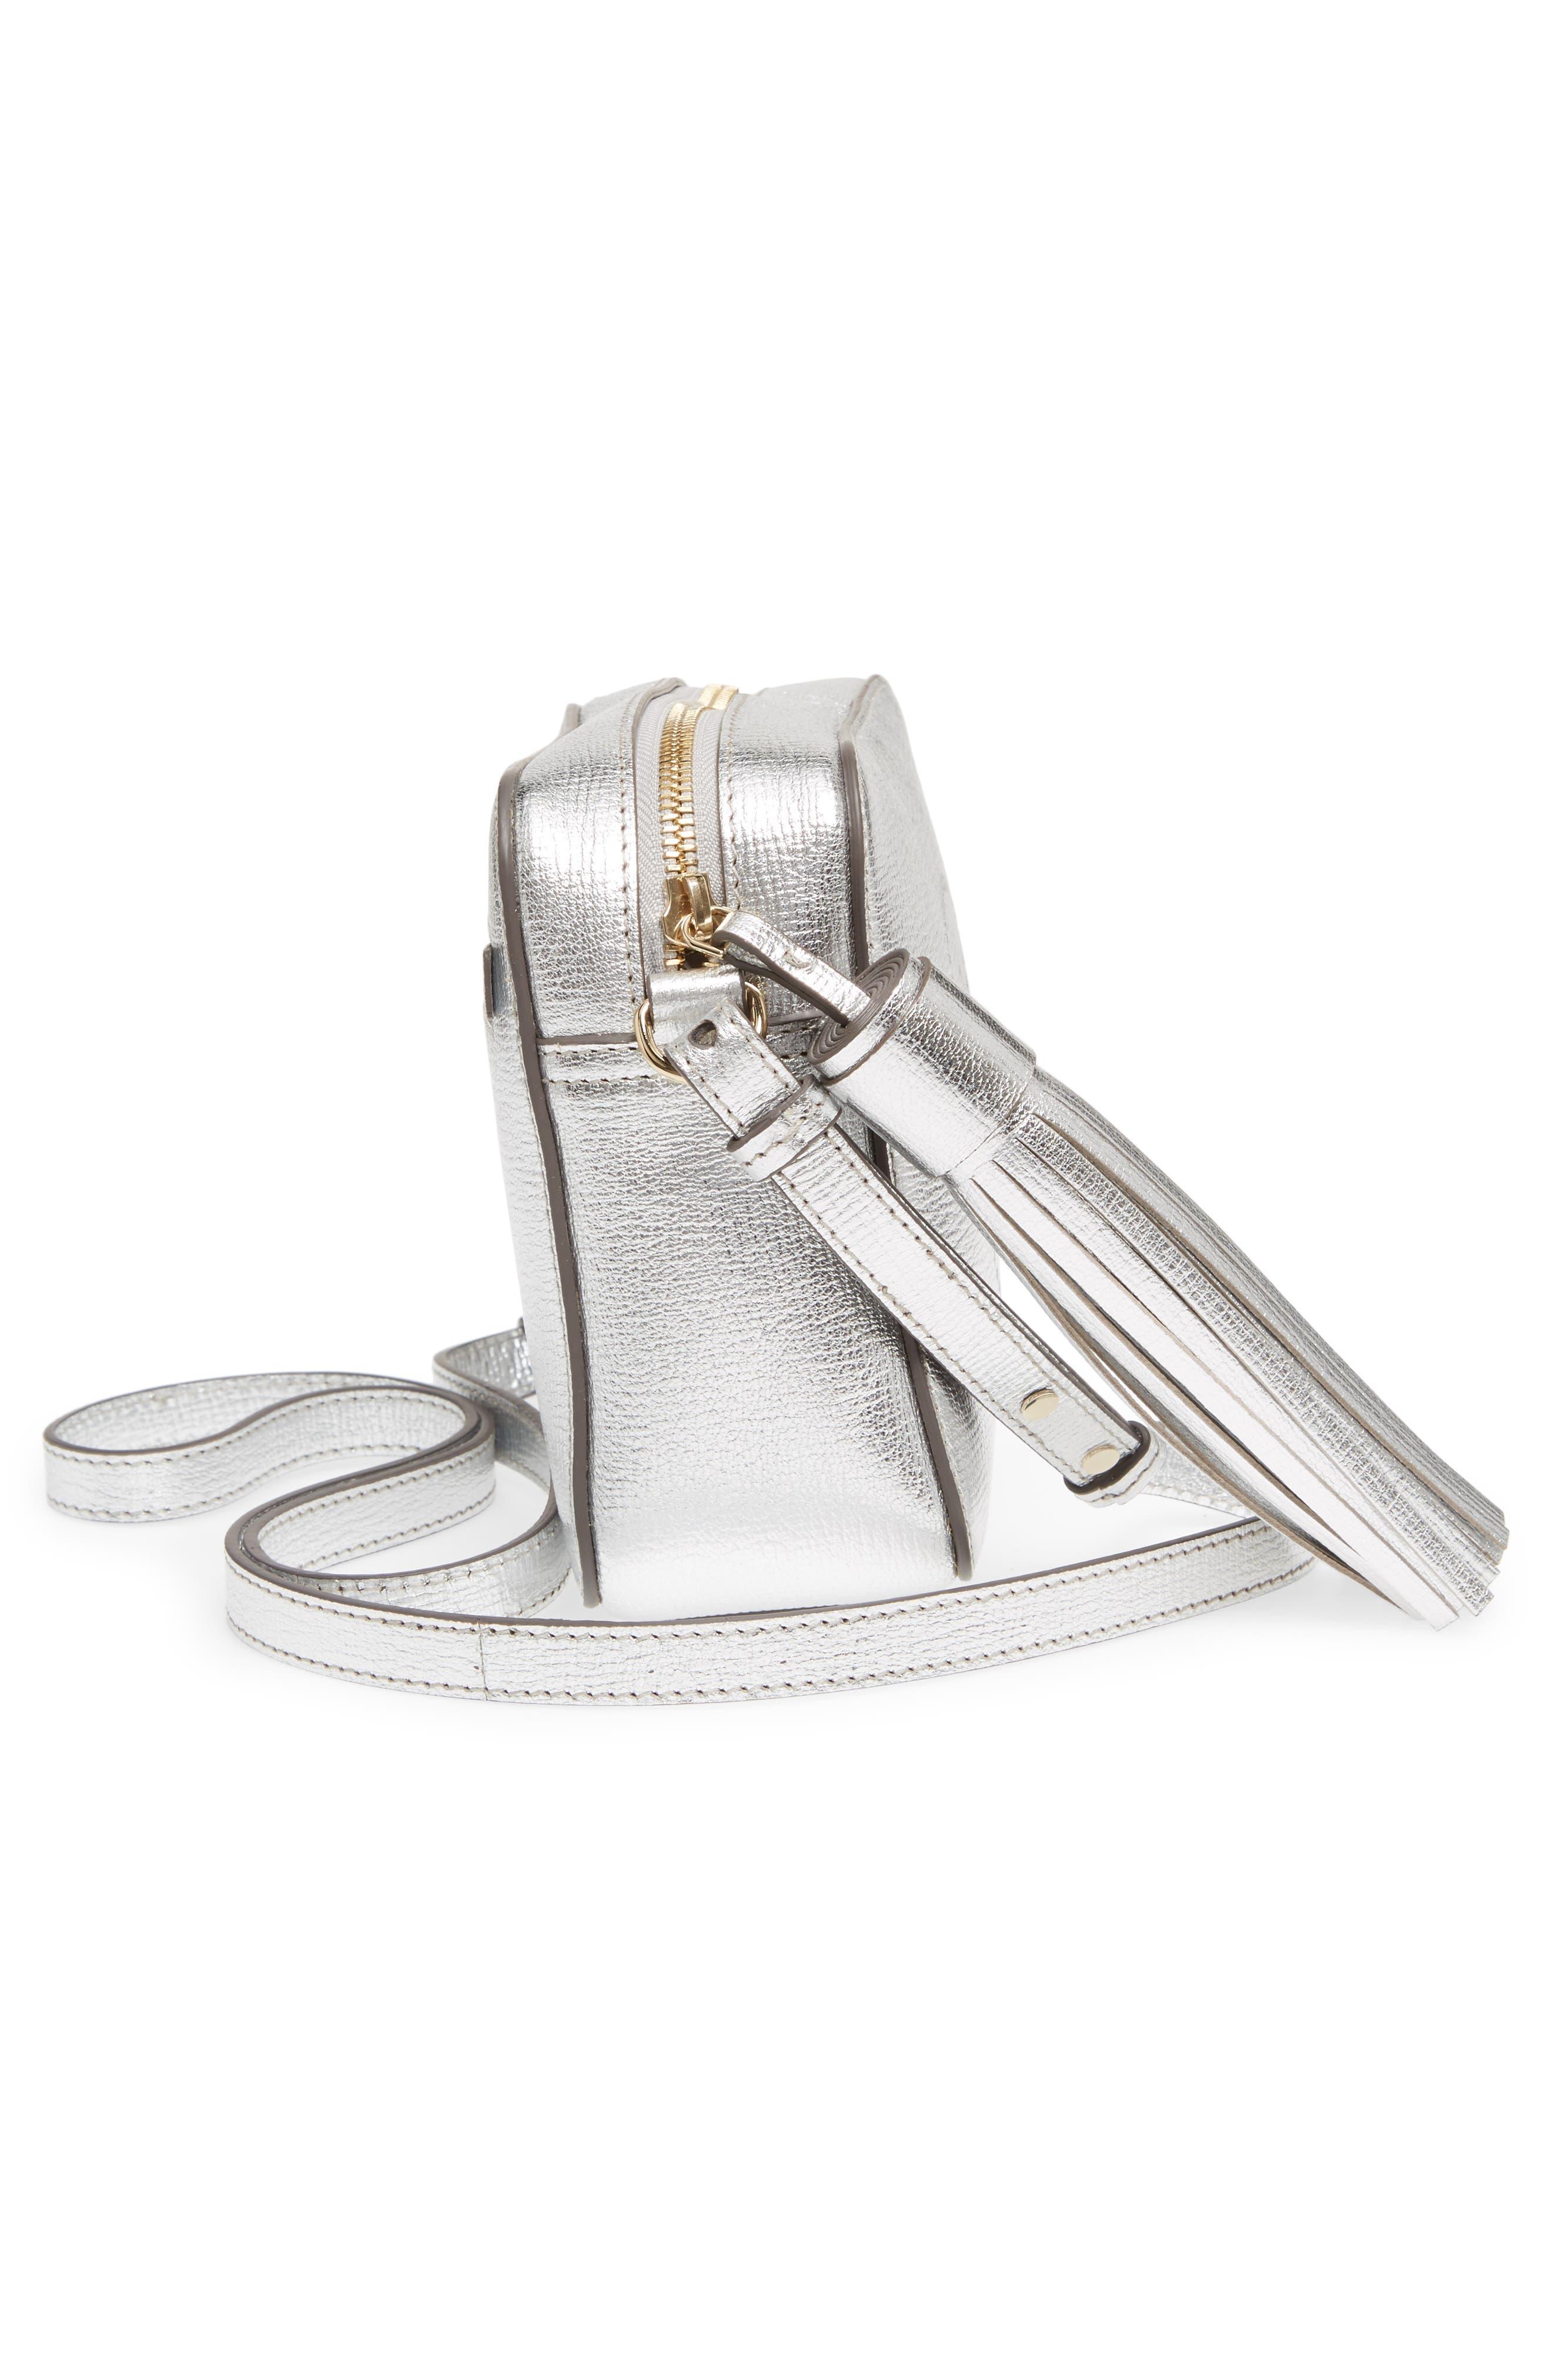 Smiley Metallic Leather Crossbody Bag,                             Alternate thumbnail 5, color,                             SILVER